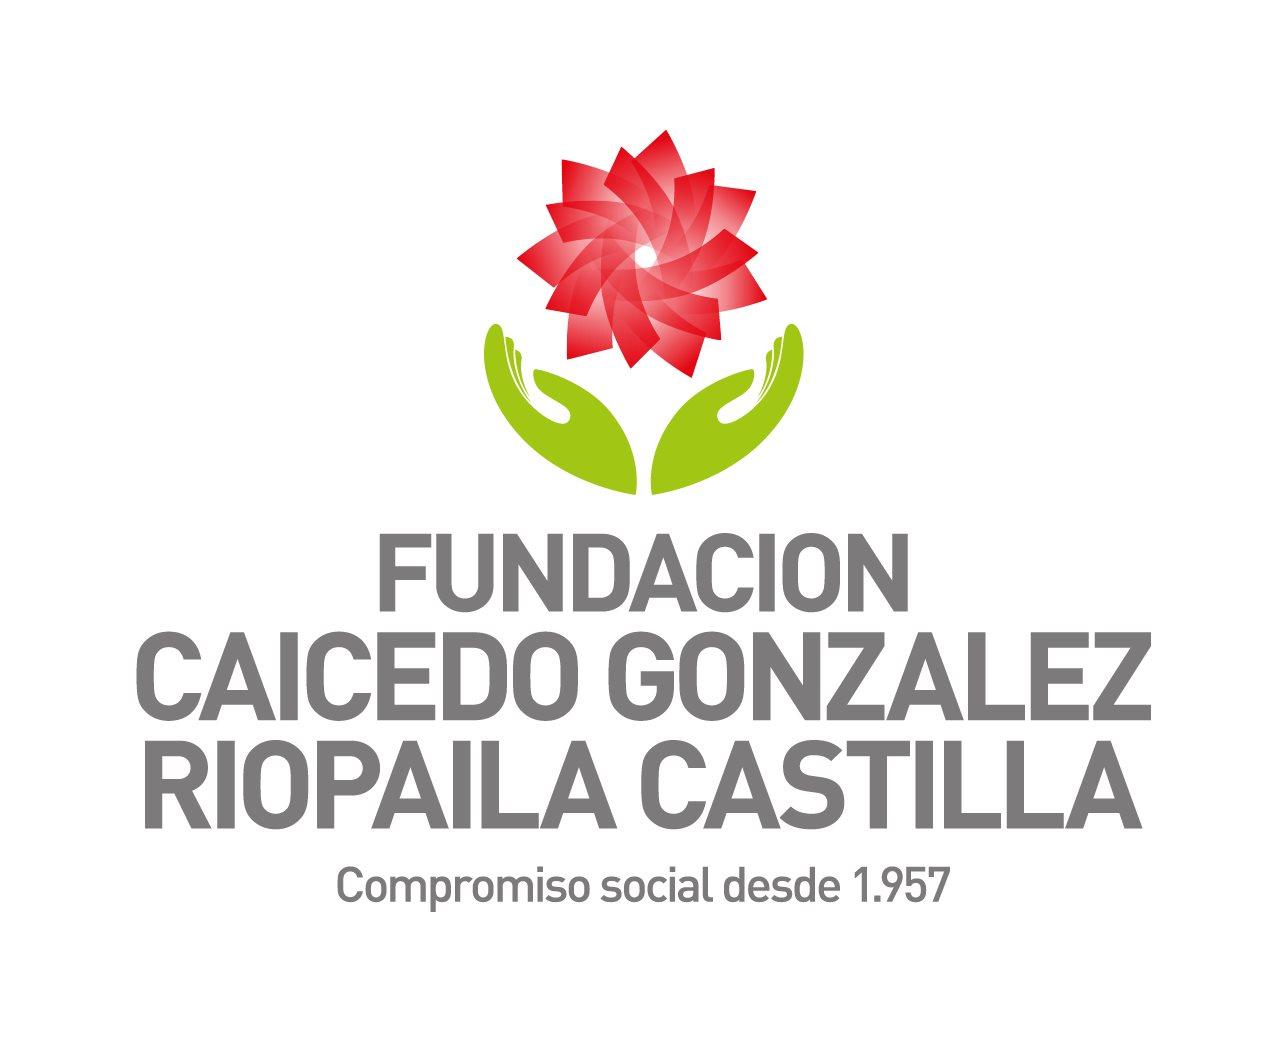 Fundacion Caicedo Gonzalez